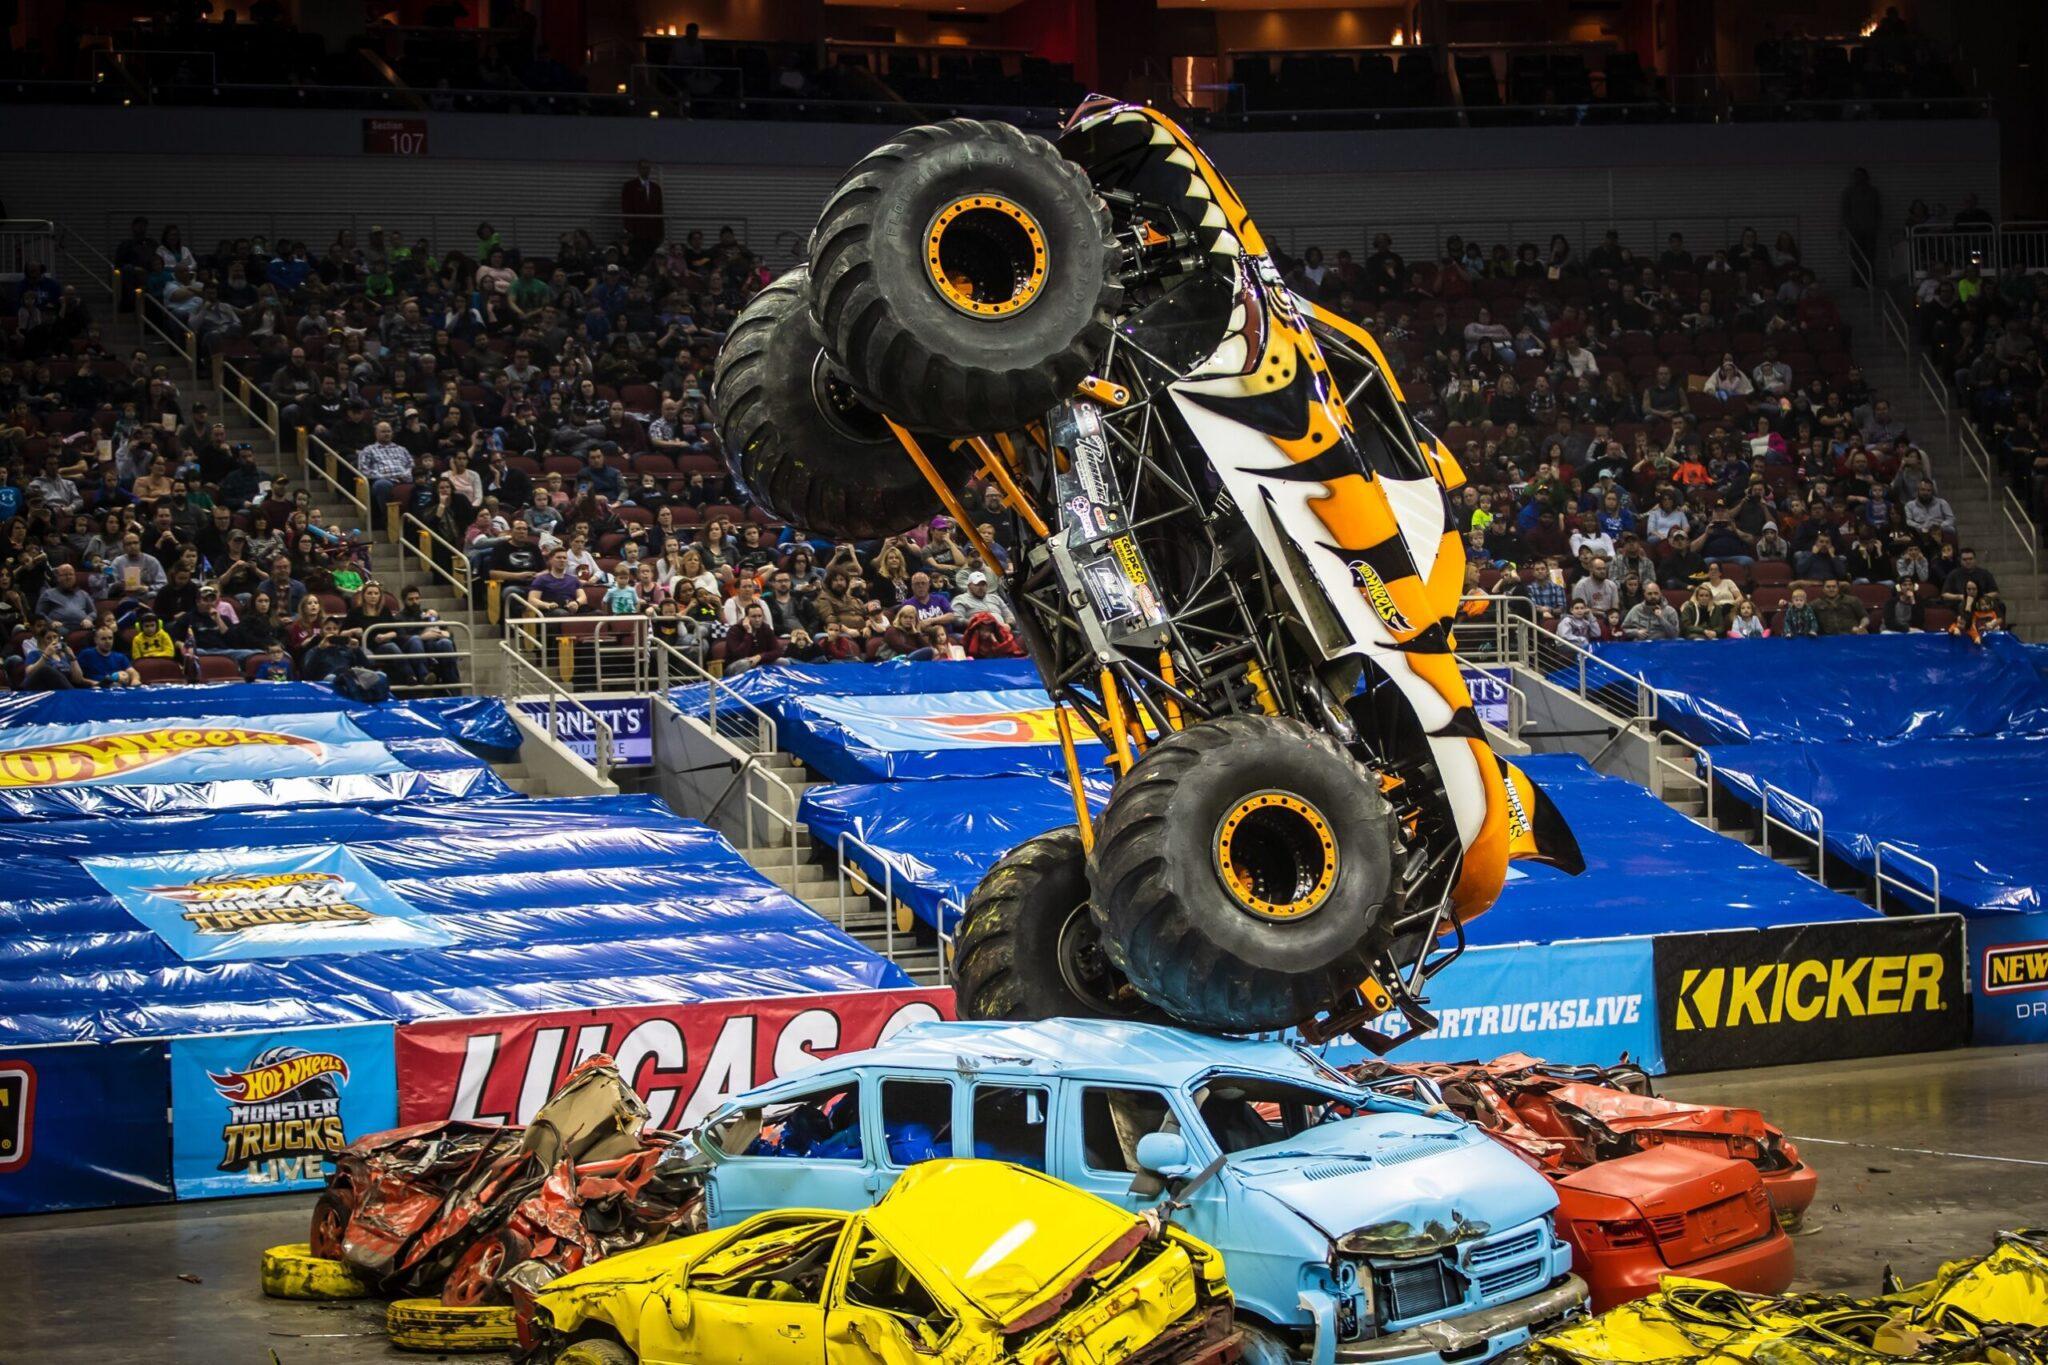 Hot Wheels Monster Trucks Live Returns to Europe with All-New Trucks for 2022